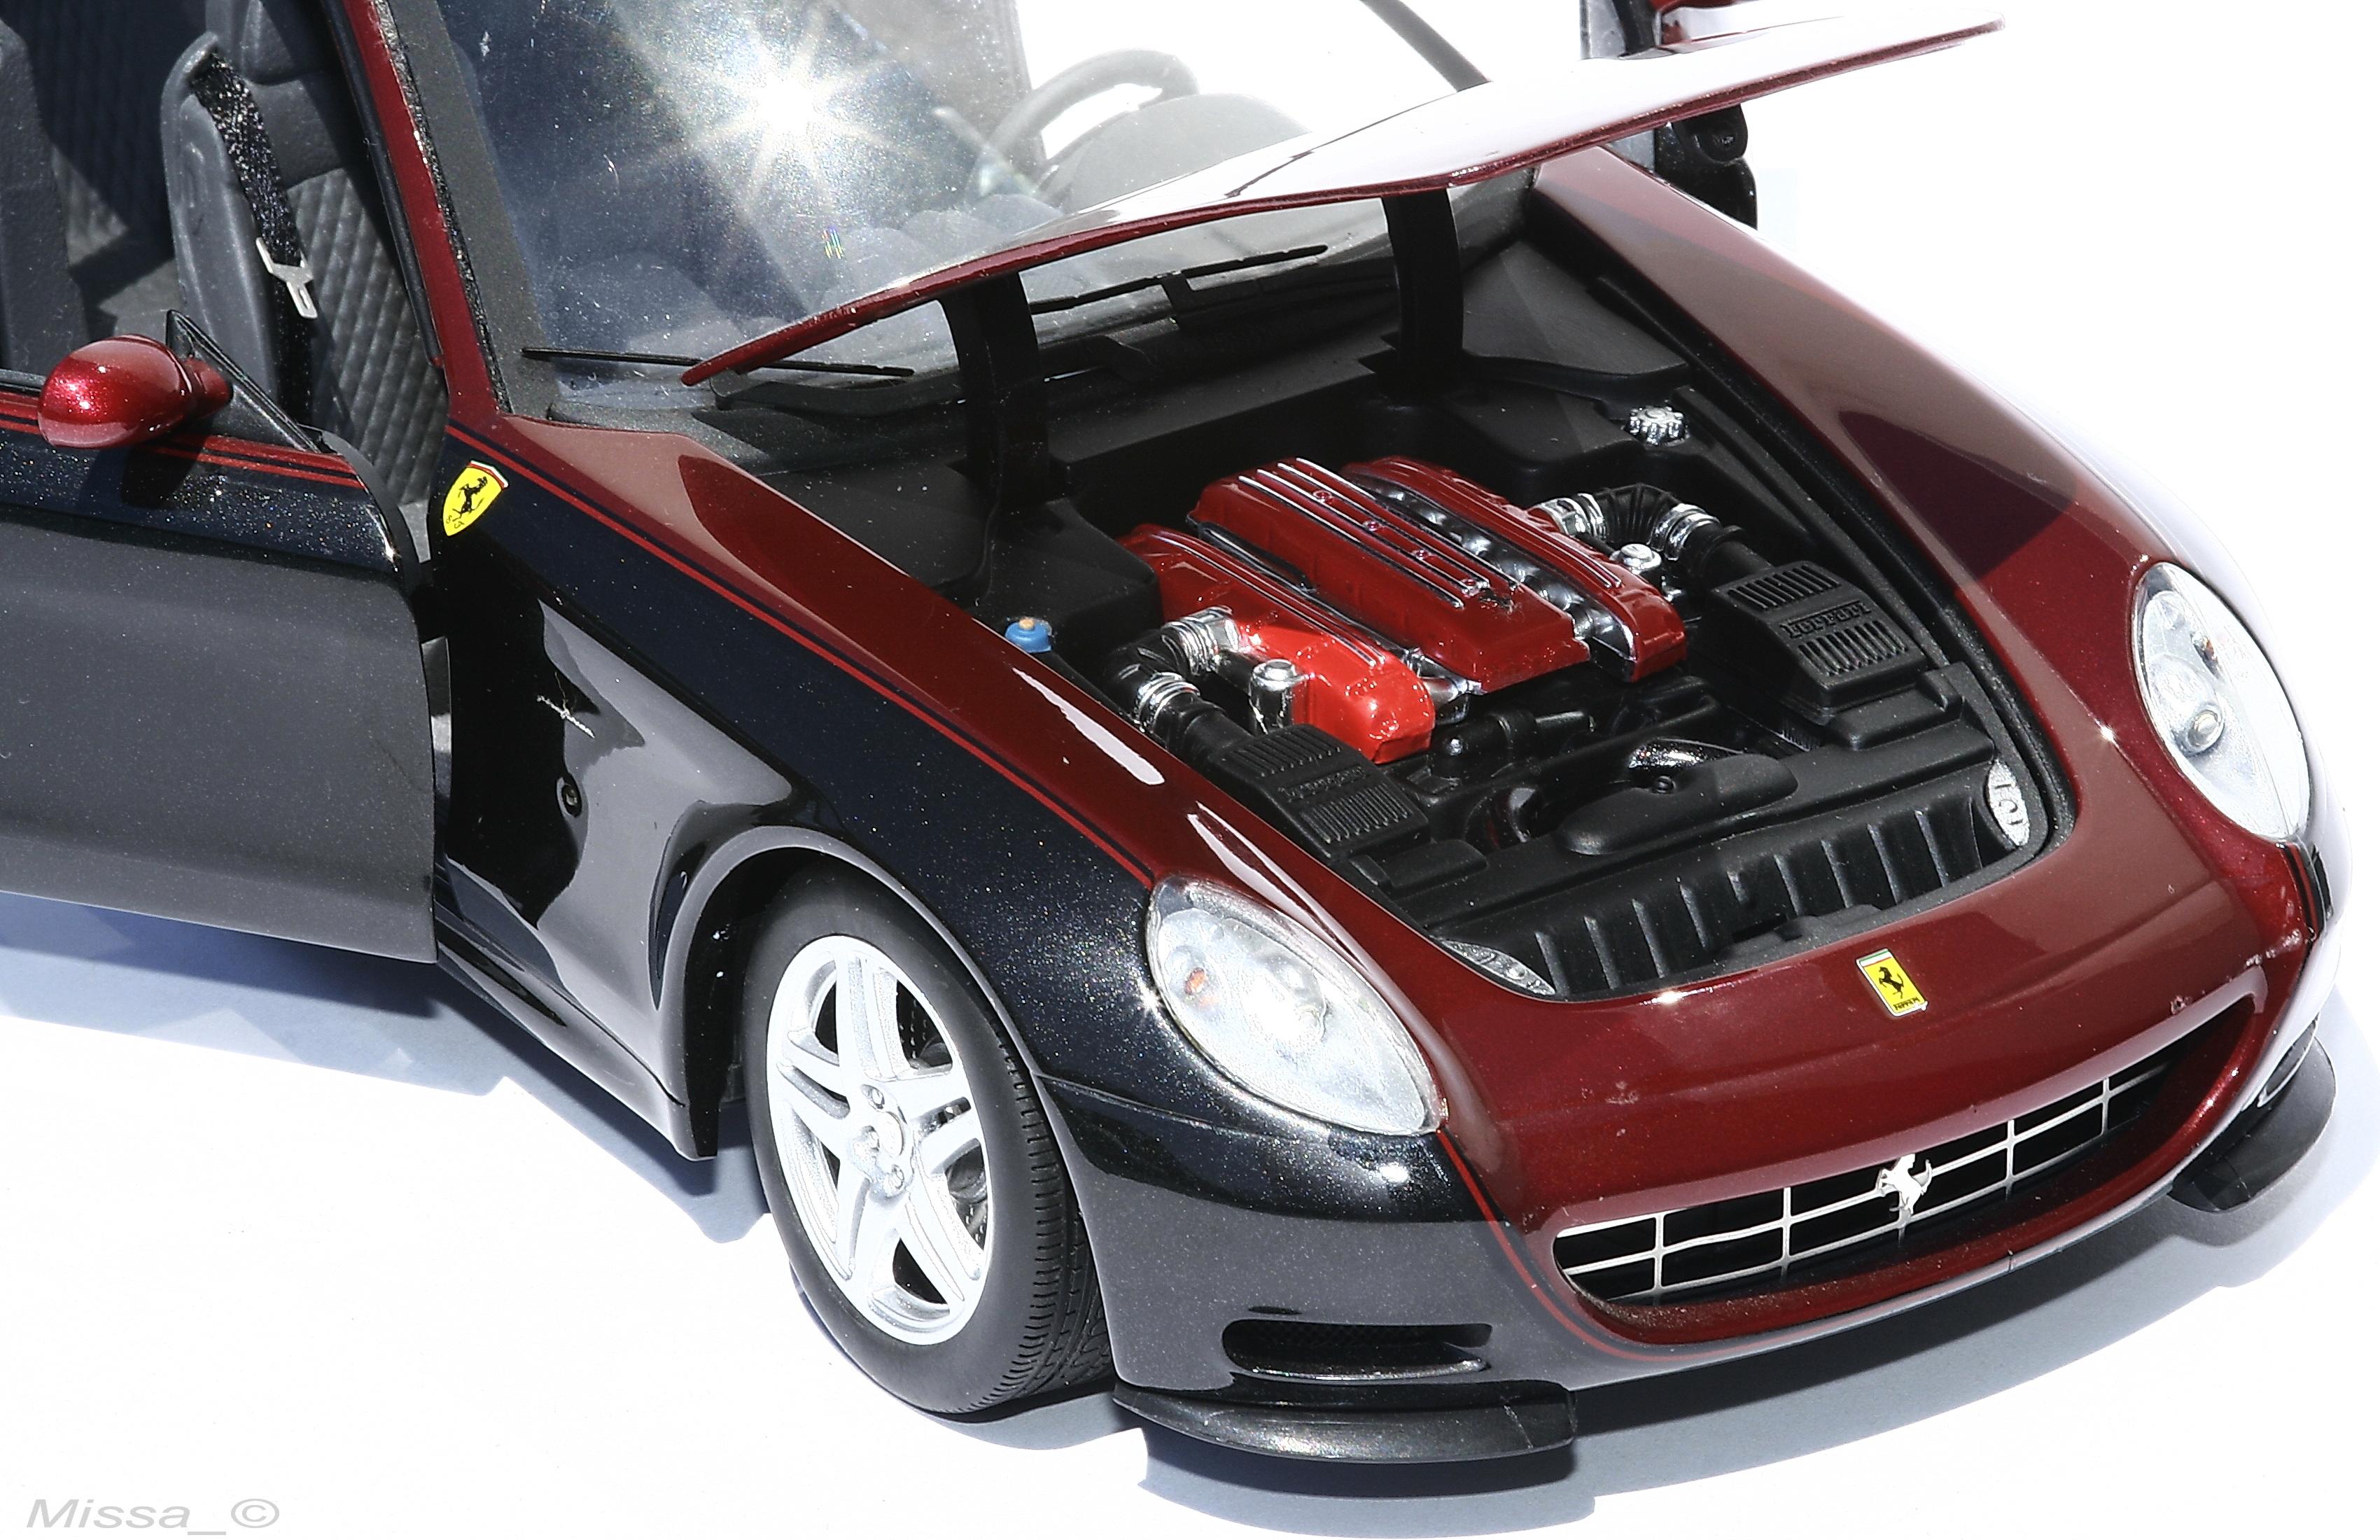 014_elite_ferrari612sg6zxq Fabulous Ferrari Mondial 8 Super Elite Cars Trend